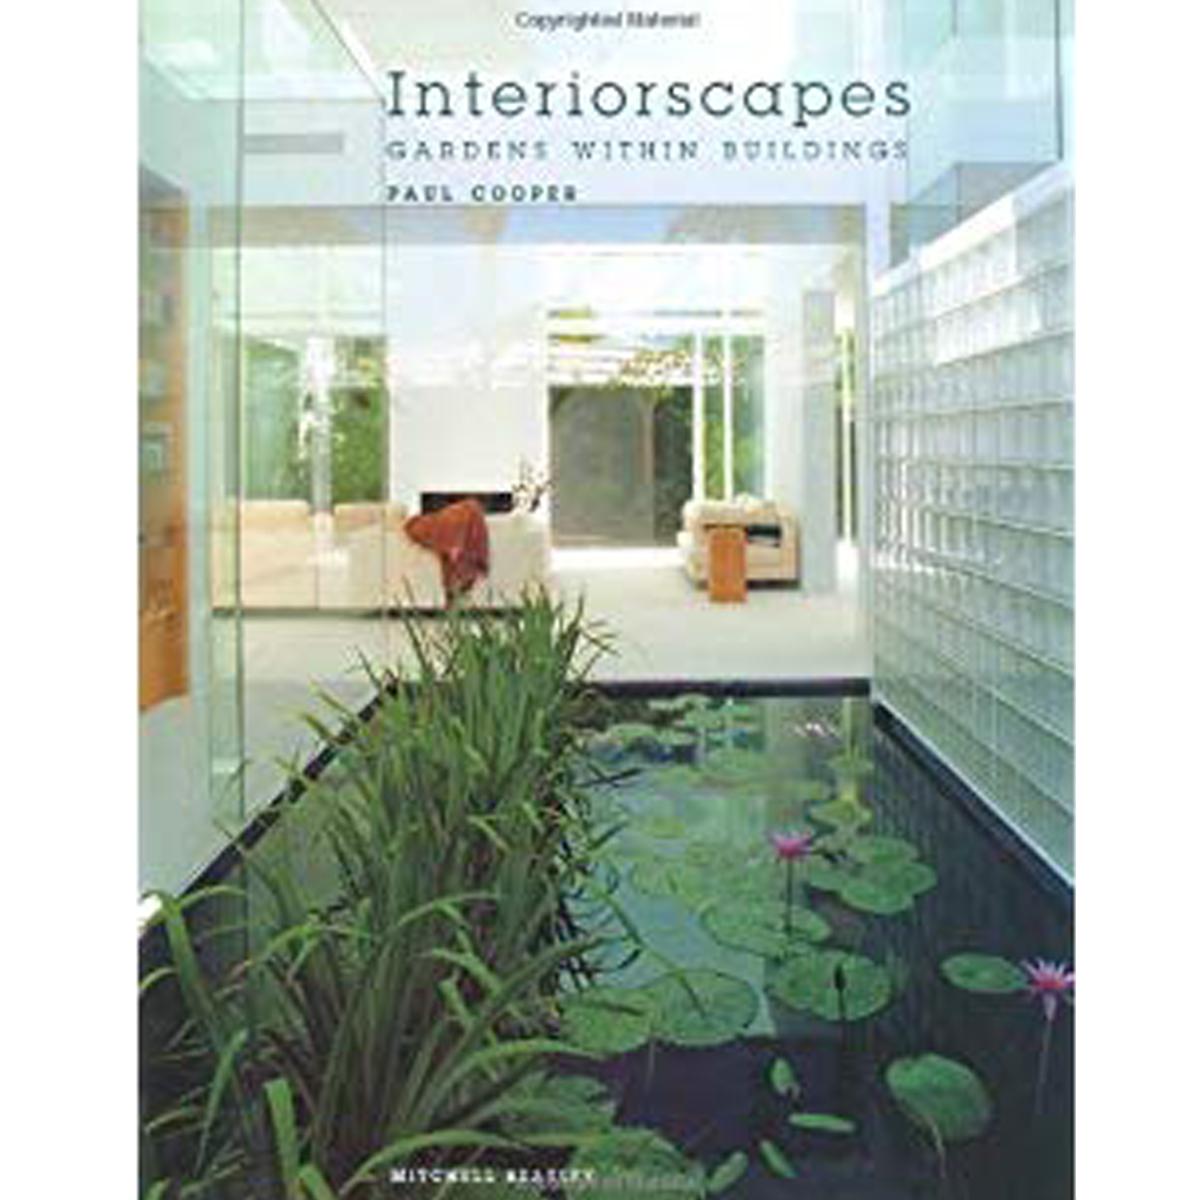 Interiorscapes